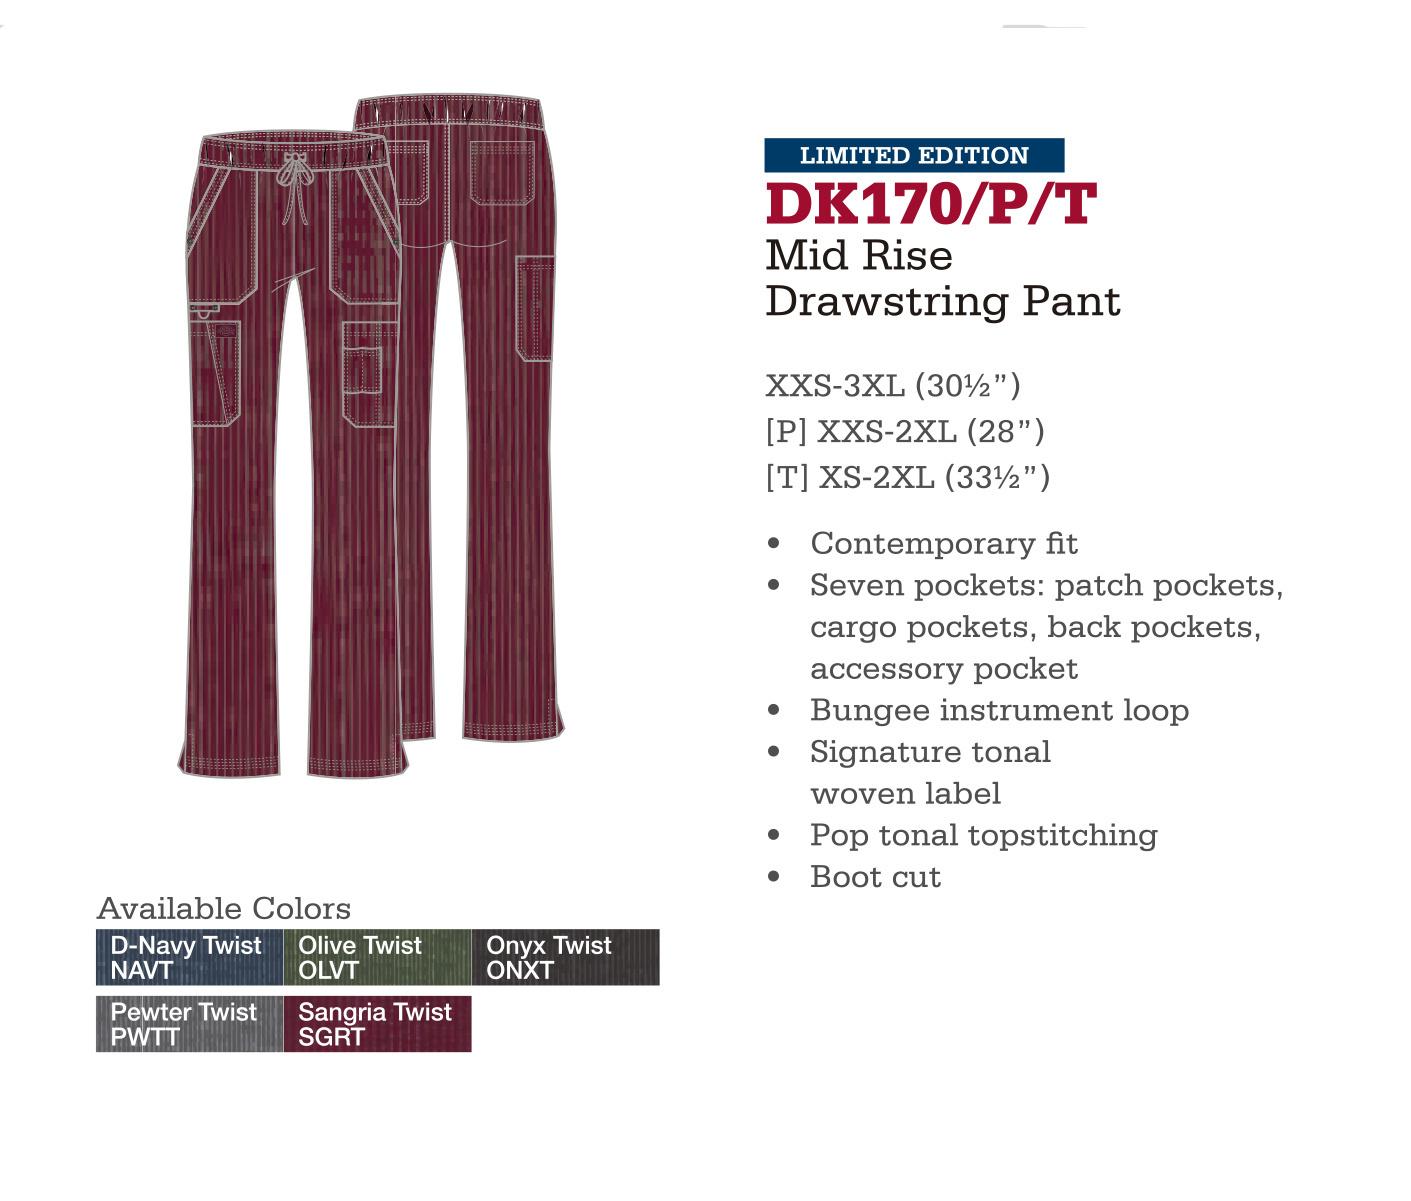 Pantalón con Cordones a Medio Levantar. DK170/P/T.